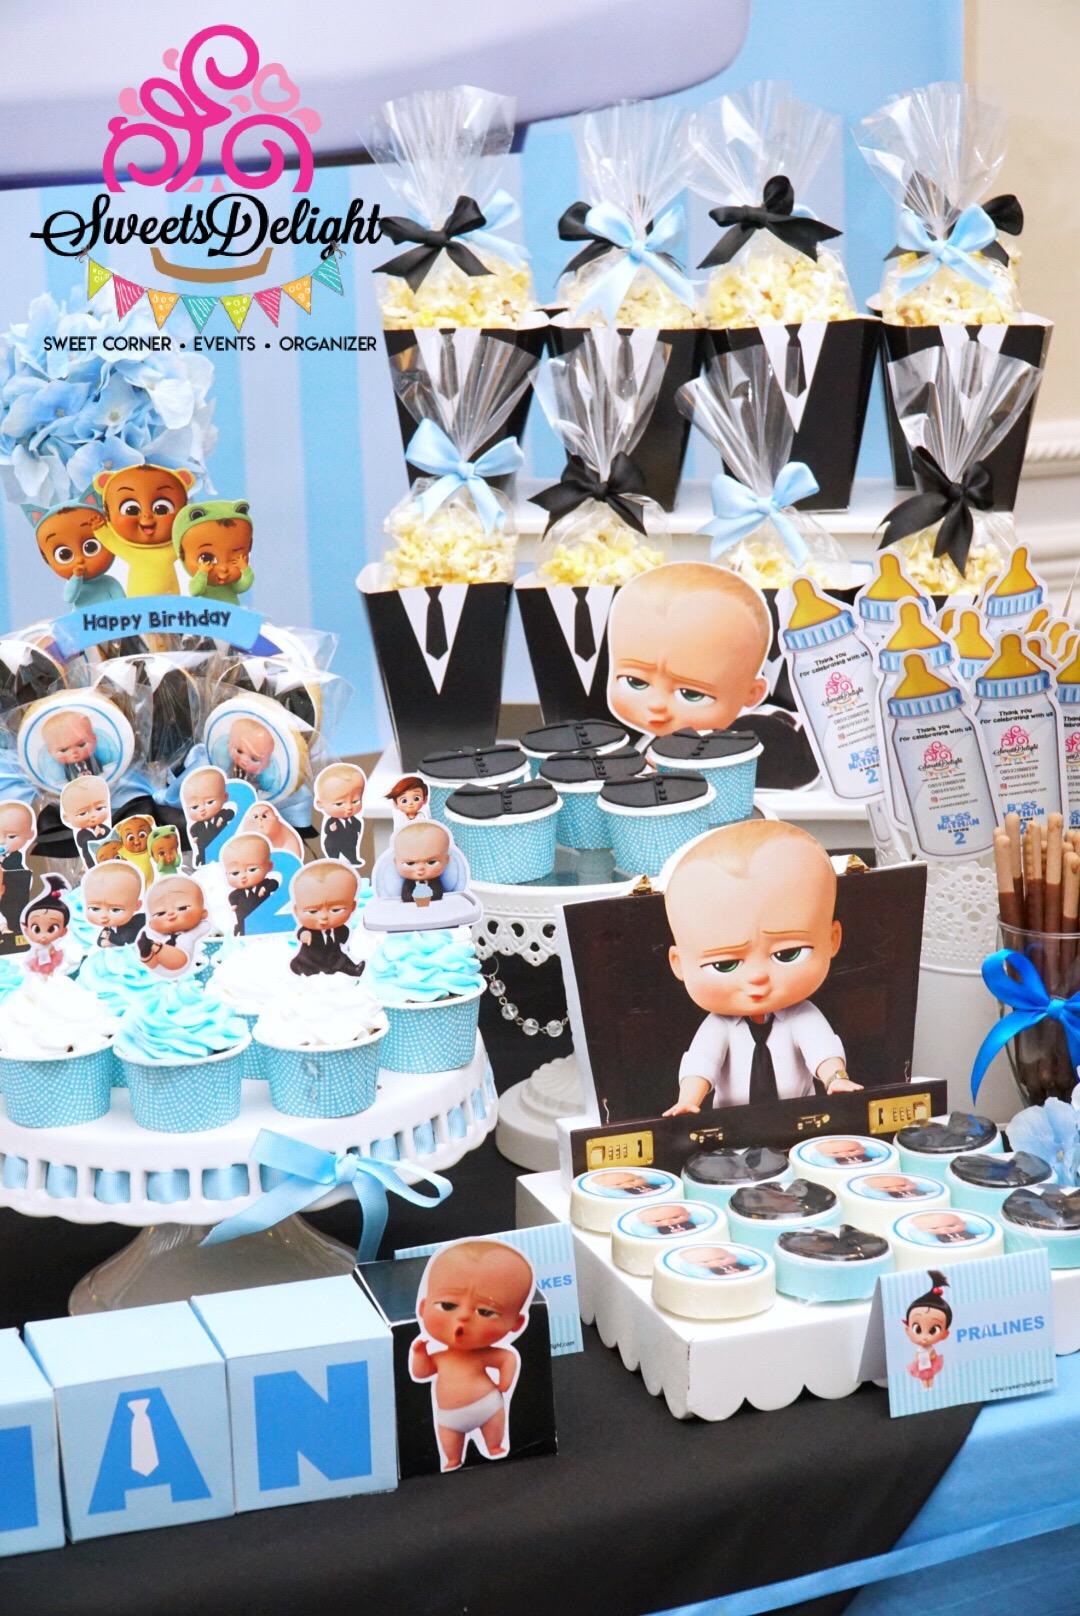 Boss Baby Dessert Table Sweets Delight